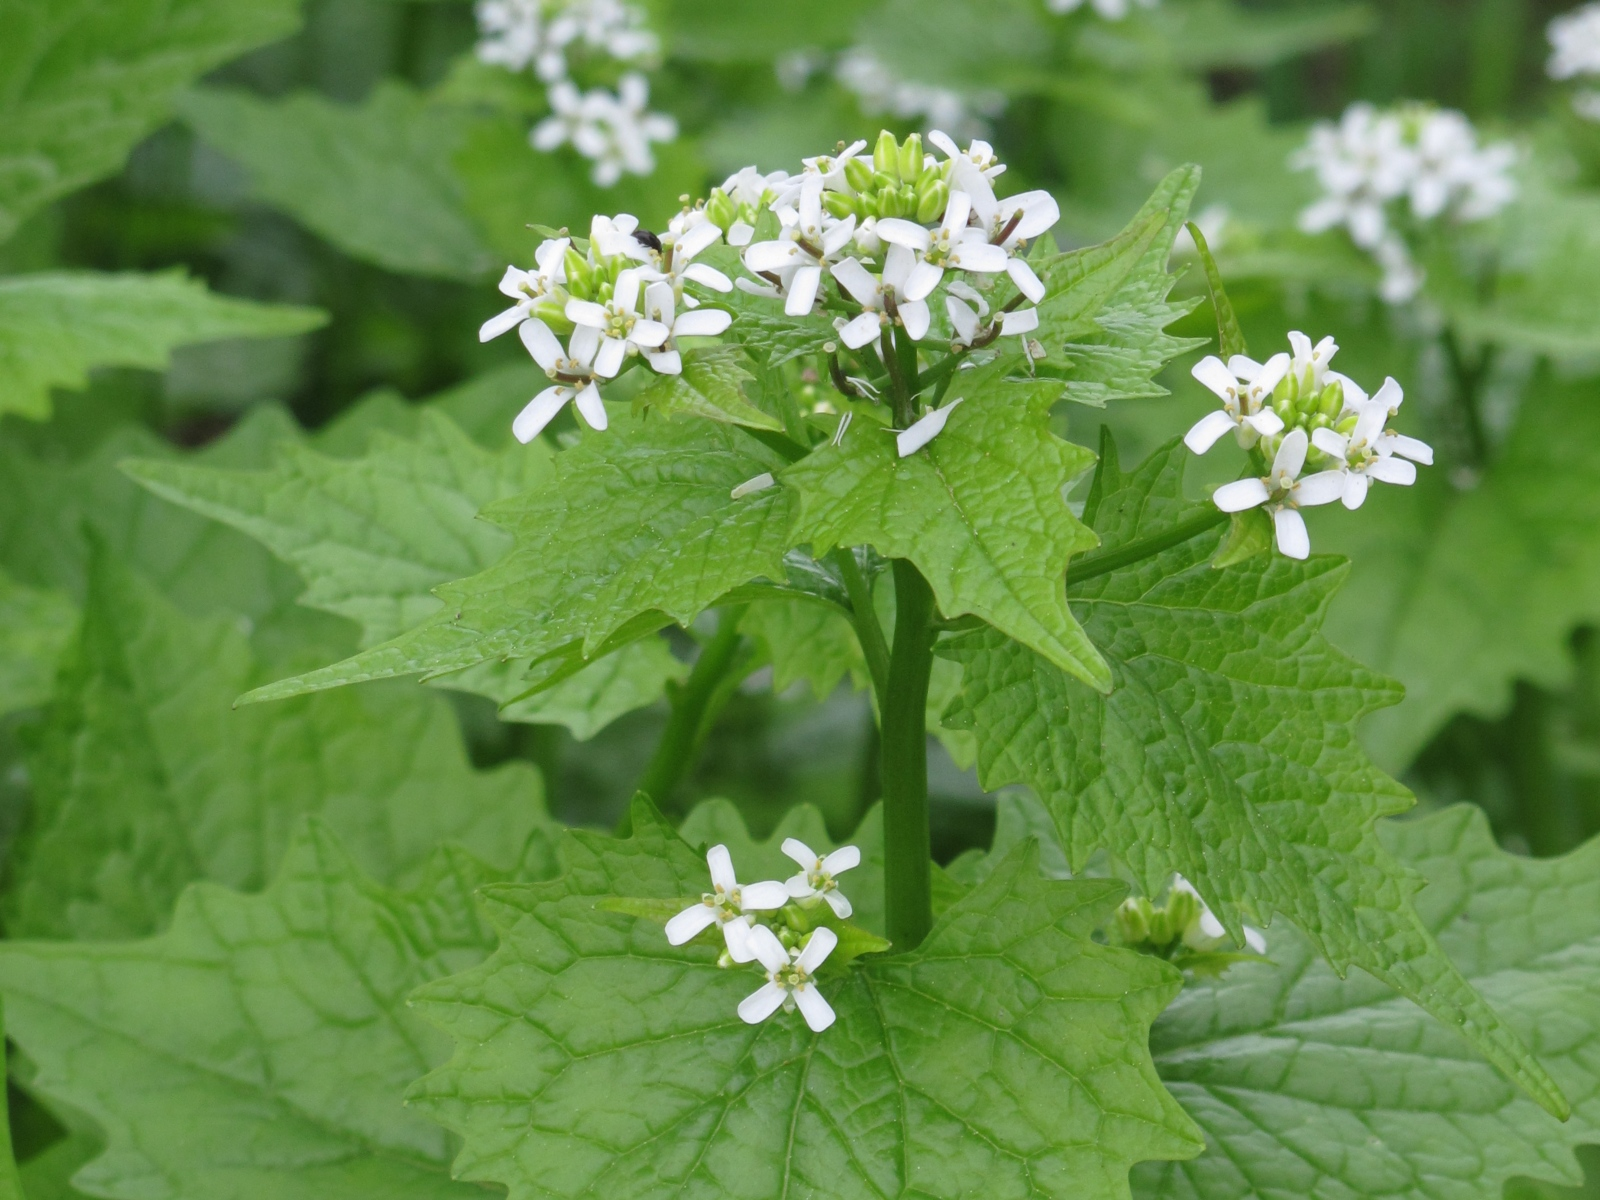 Jack in the hedge or garlic mustard in flower